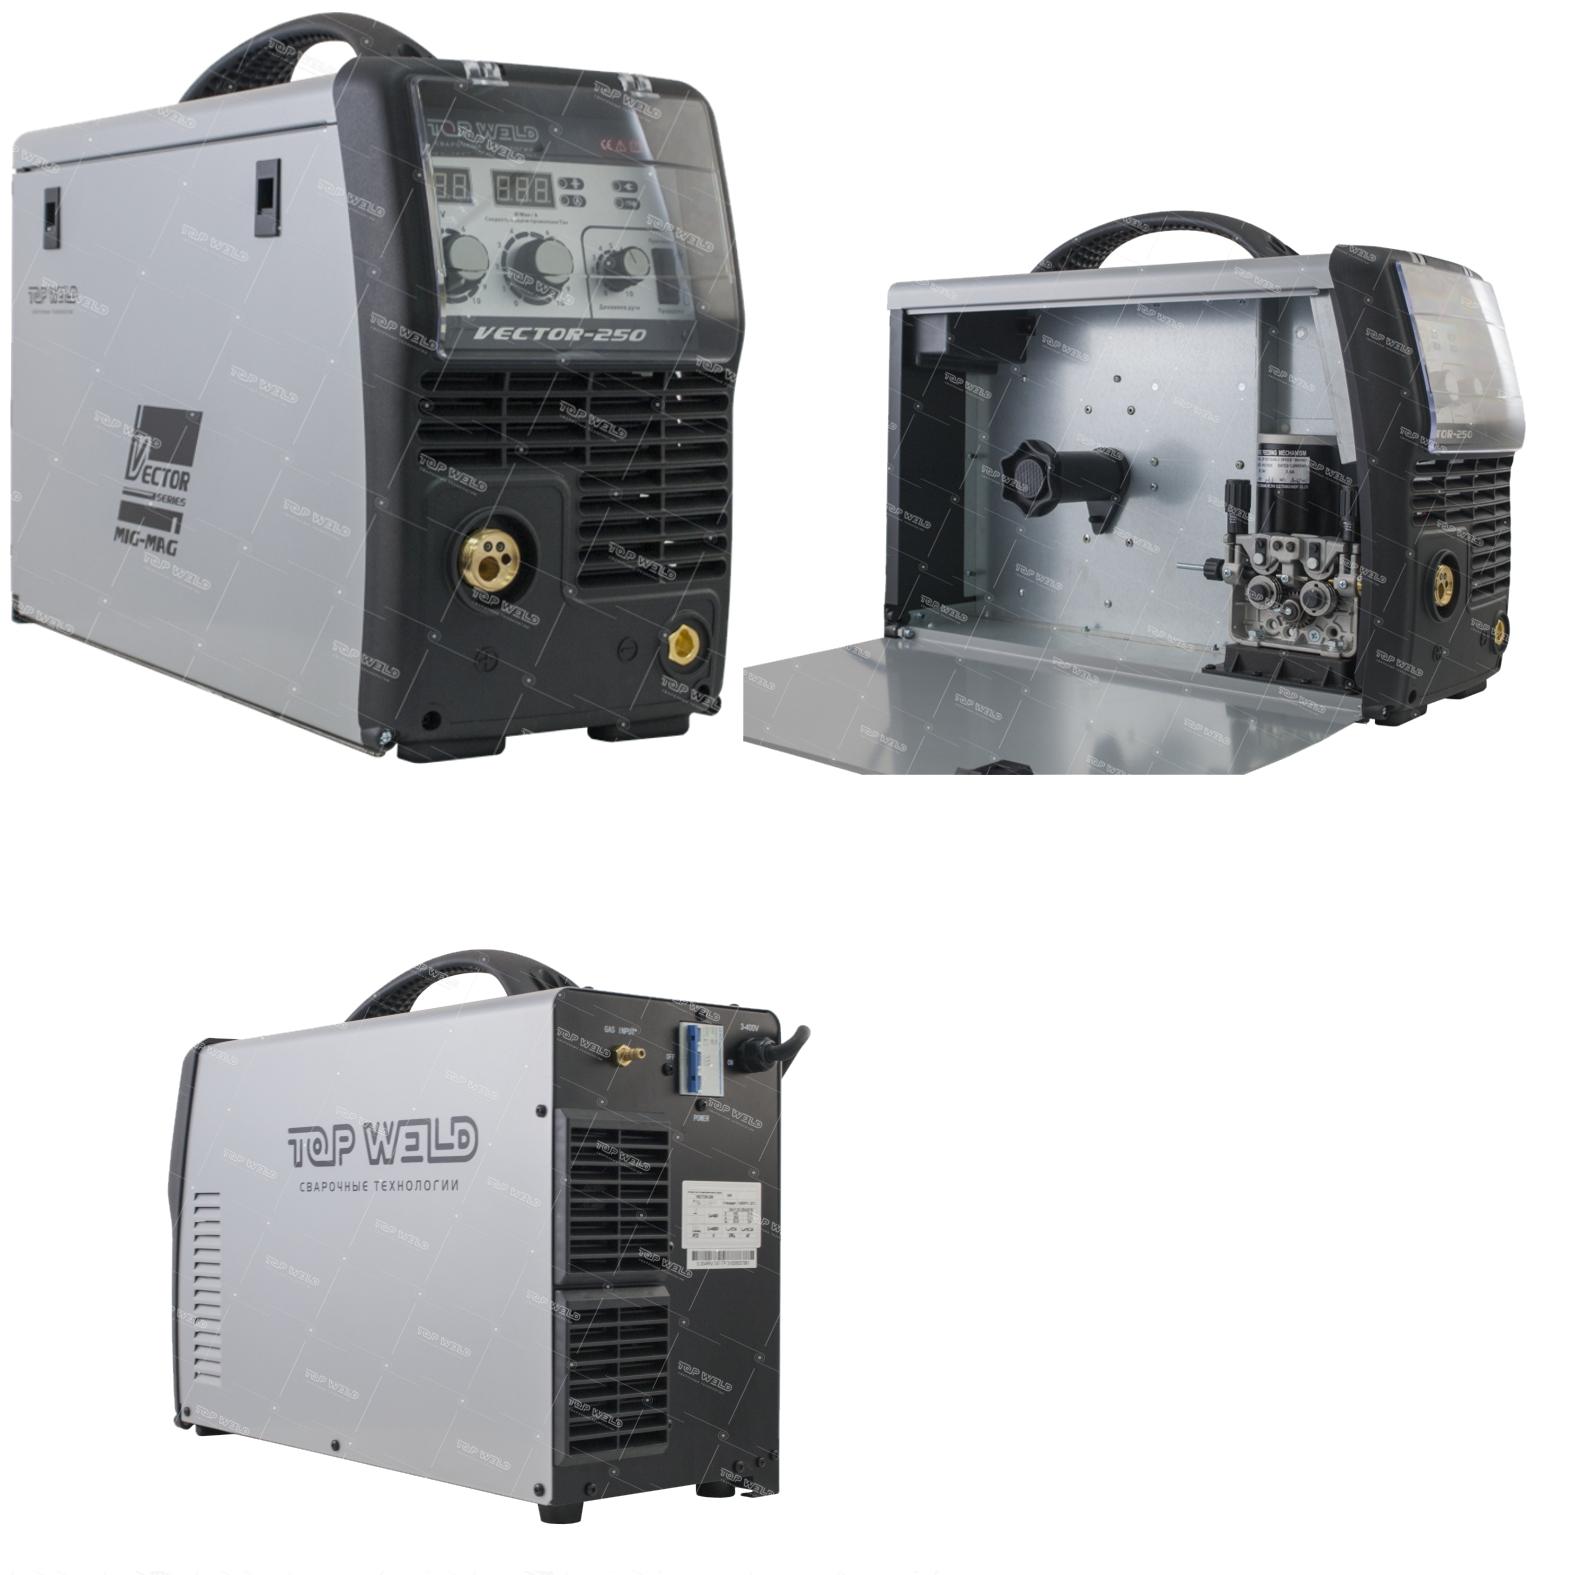 MIG 250 IGBT